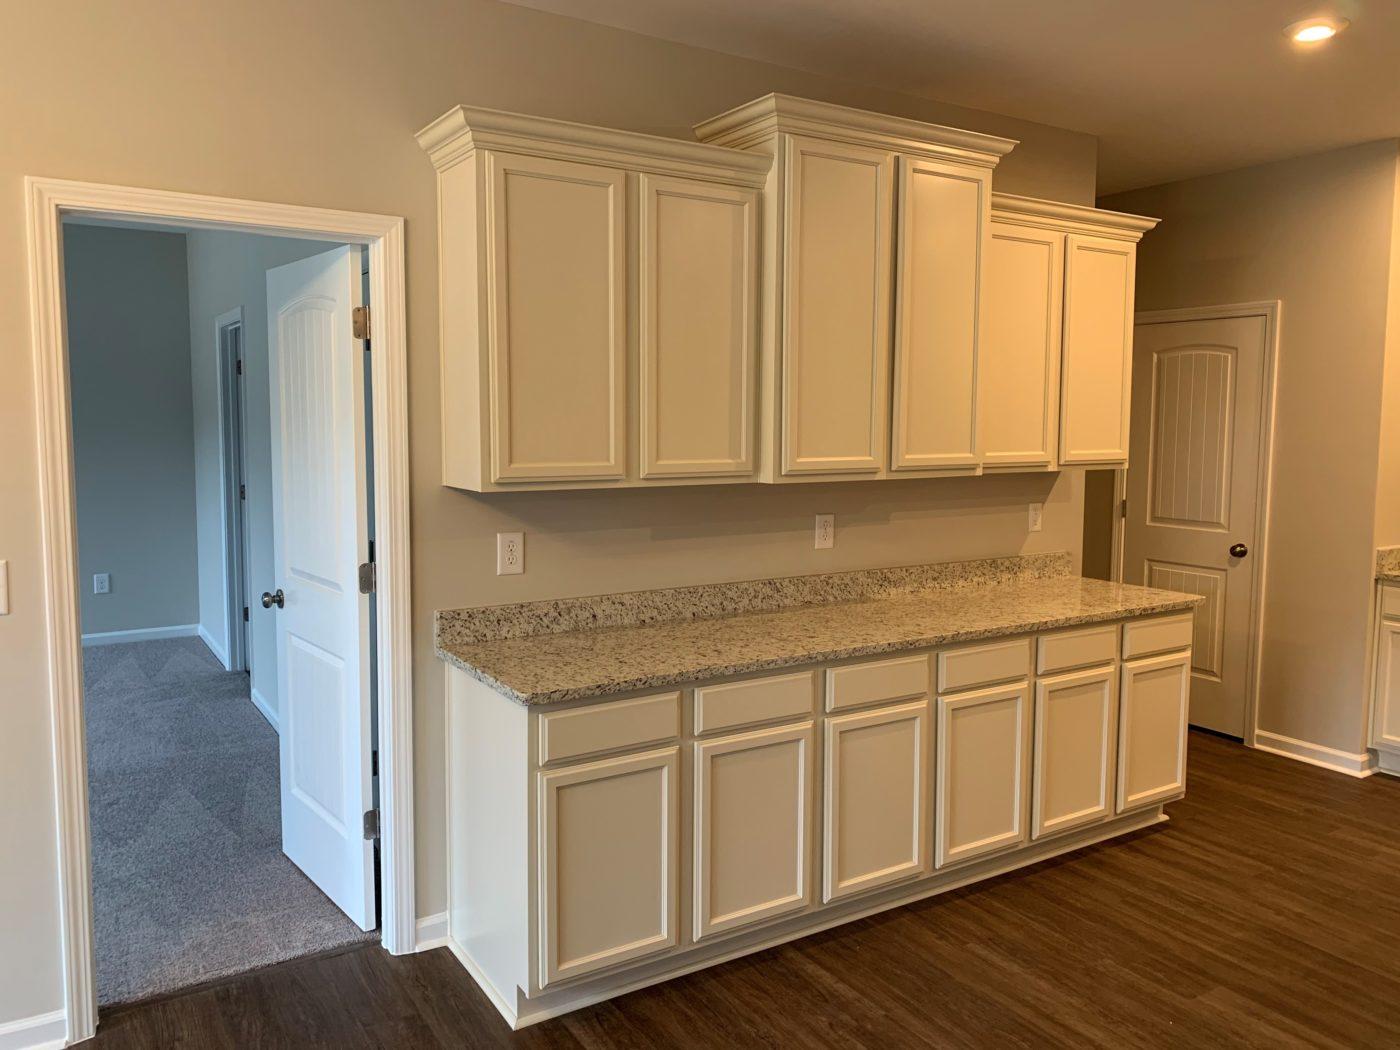 Kitchen Cabinets Raleigh Traditional Brunswick Linen Crown Bar Granite